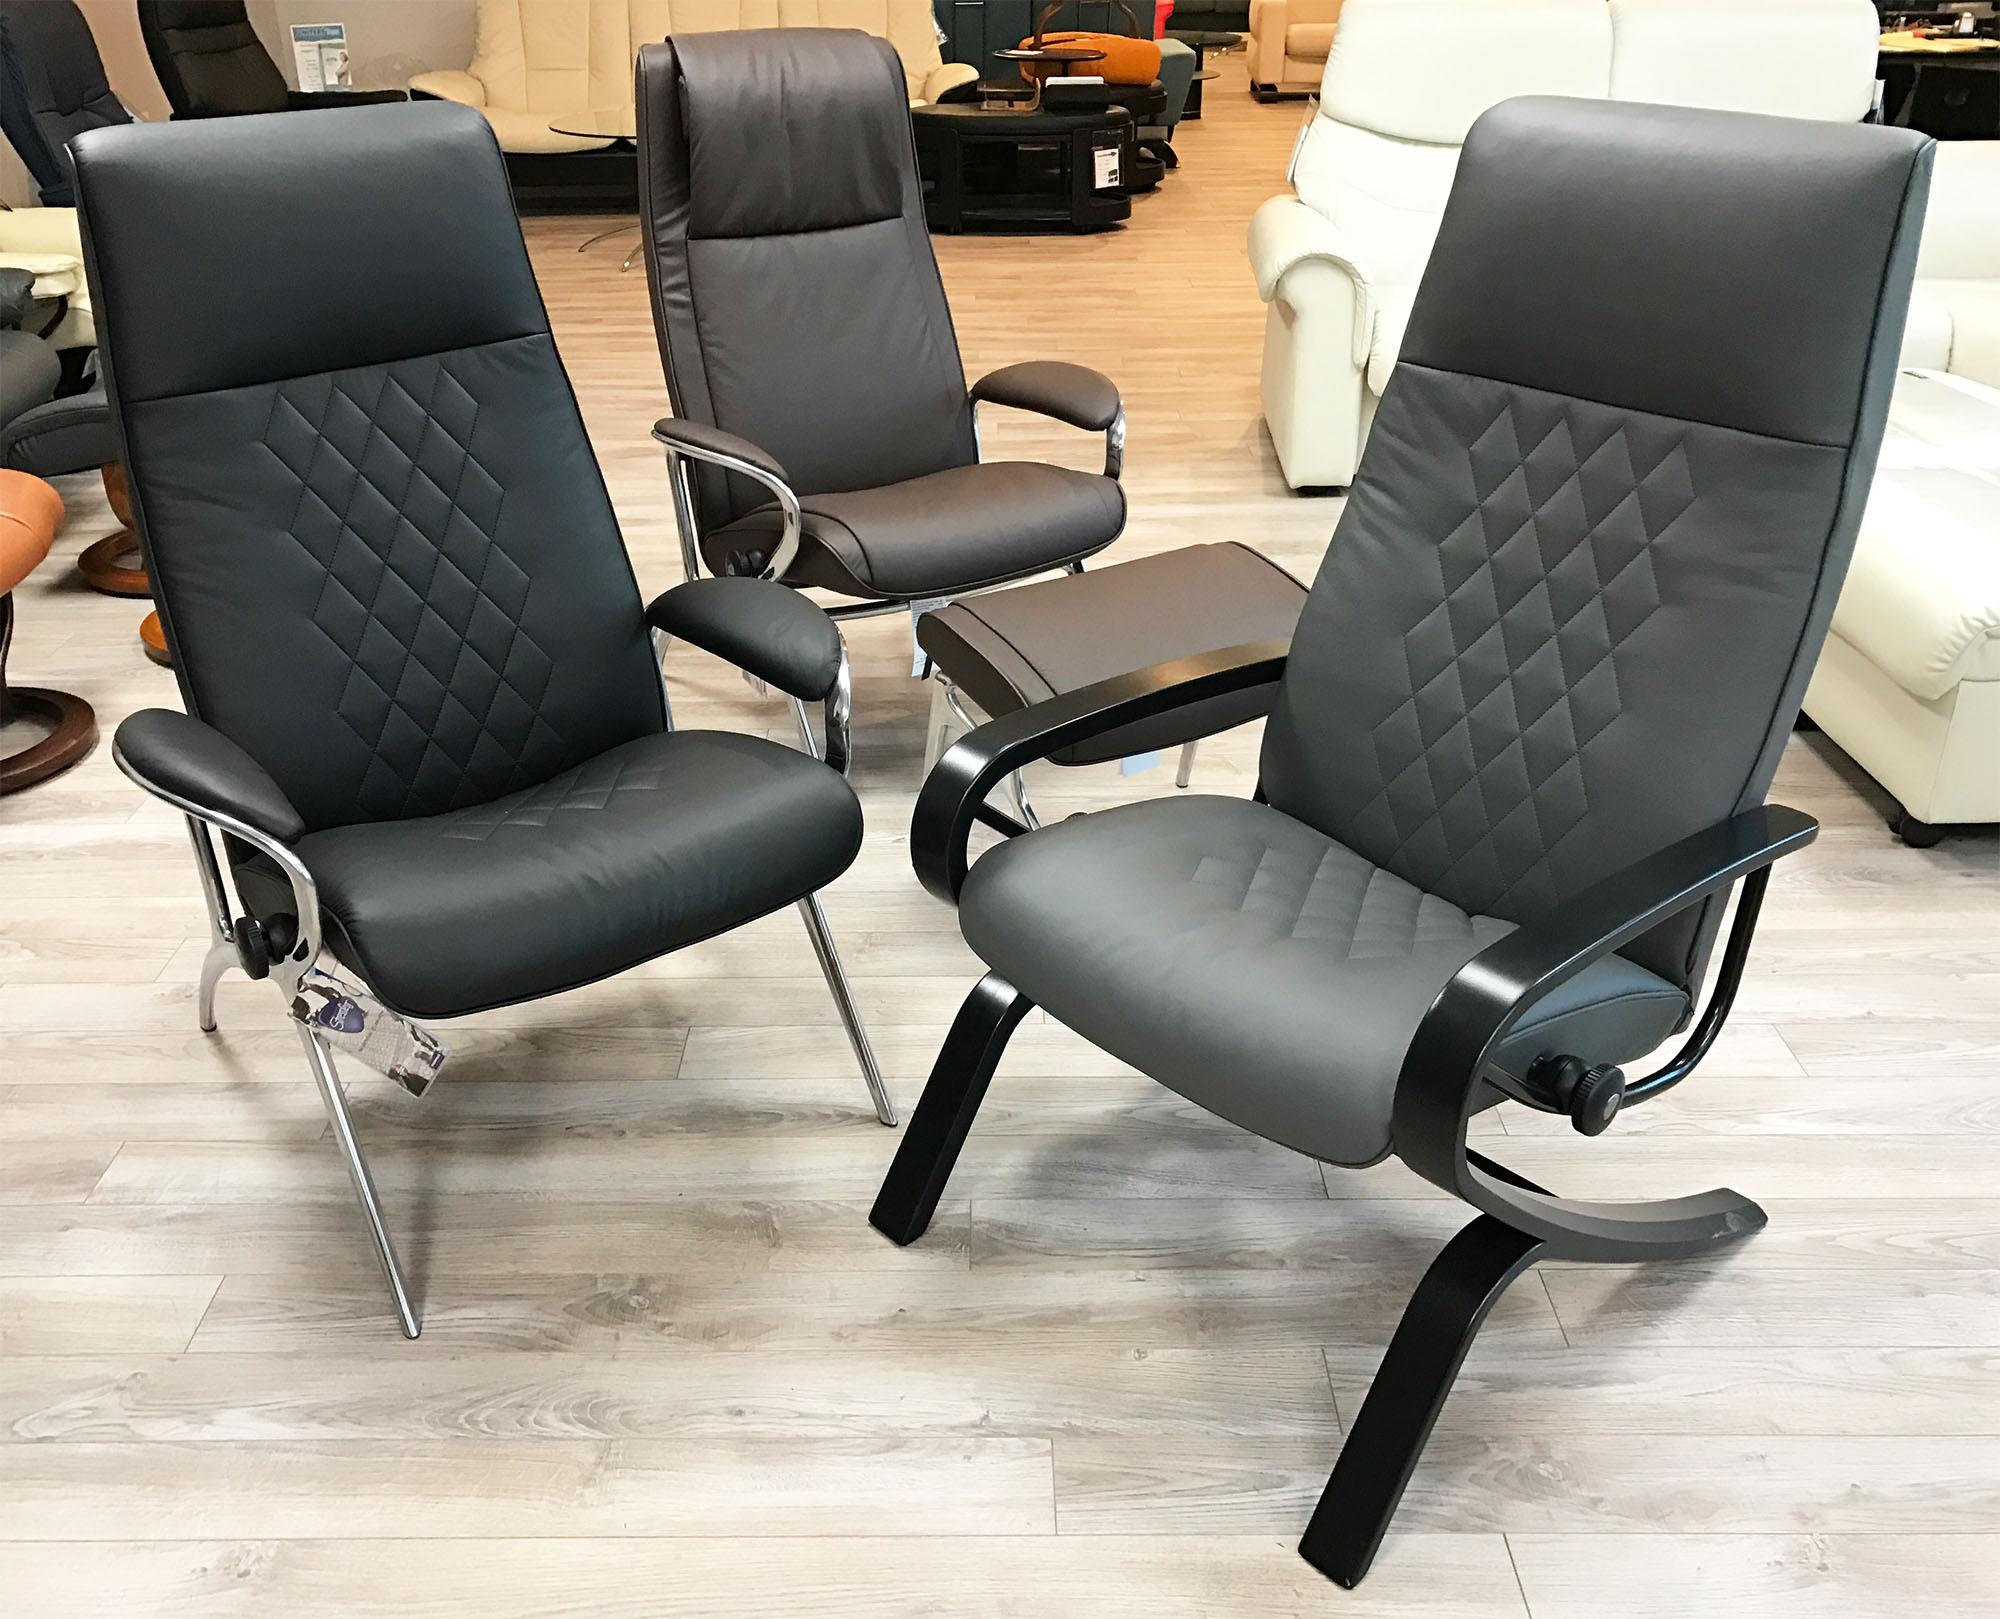 Stressless You James Aluminum Recliner Chair In Batick